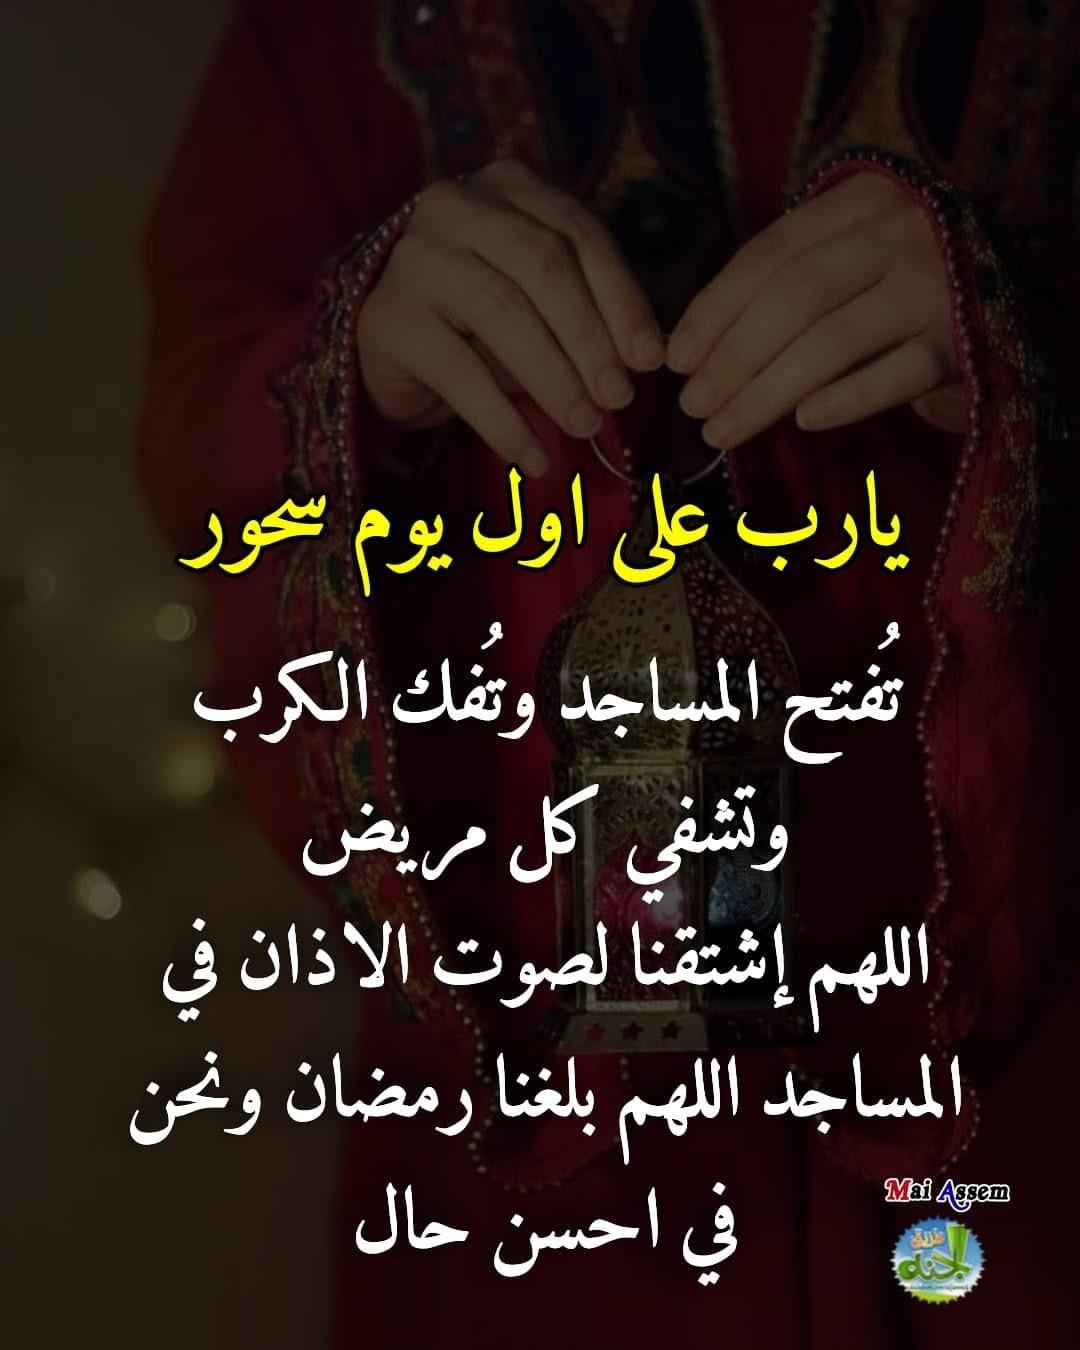 Pin By Abdul Rahim On دعاء Ramadan Quotes Islamic Phrases Quran Verses